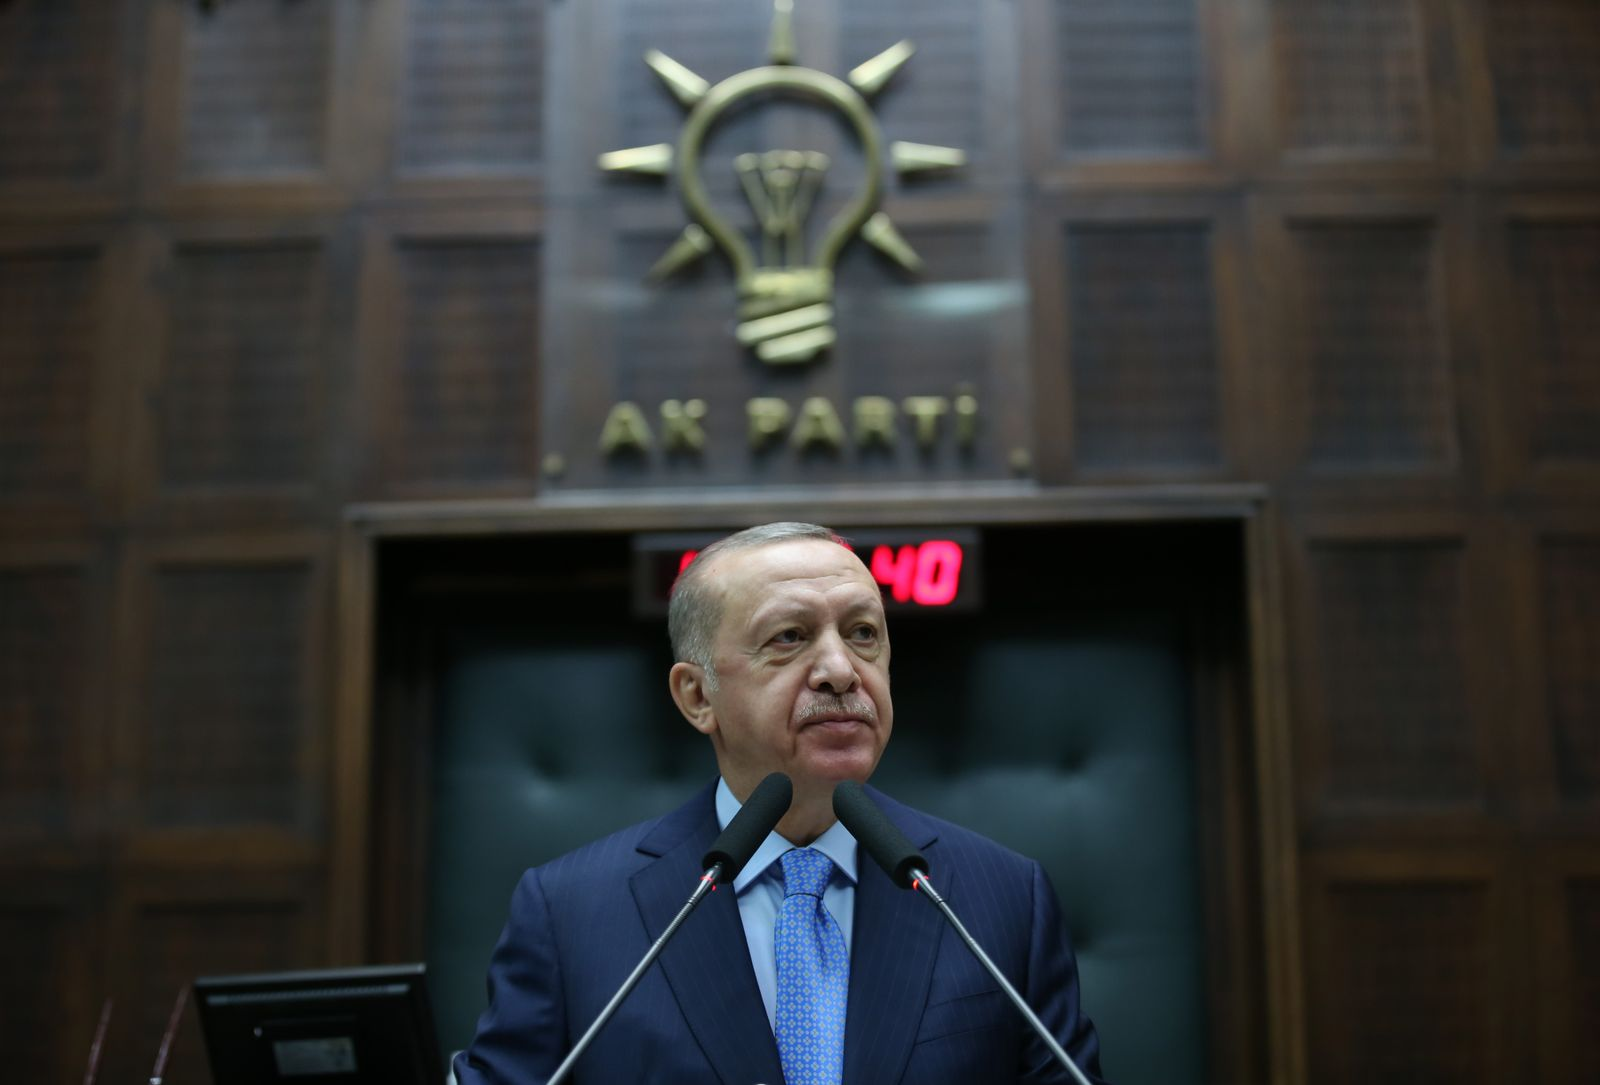 Turkish President Erdogan addresses AKP members at the parliament in Ankara, Turkey - 11 Nov 2020